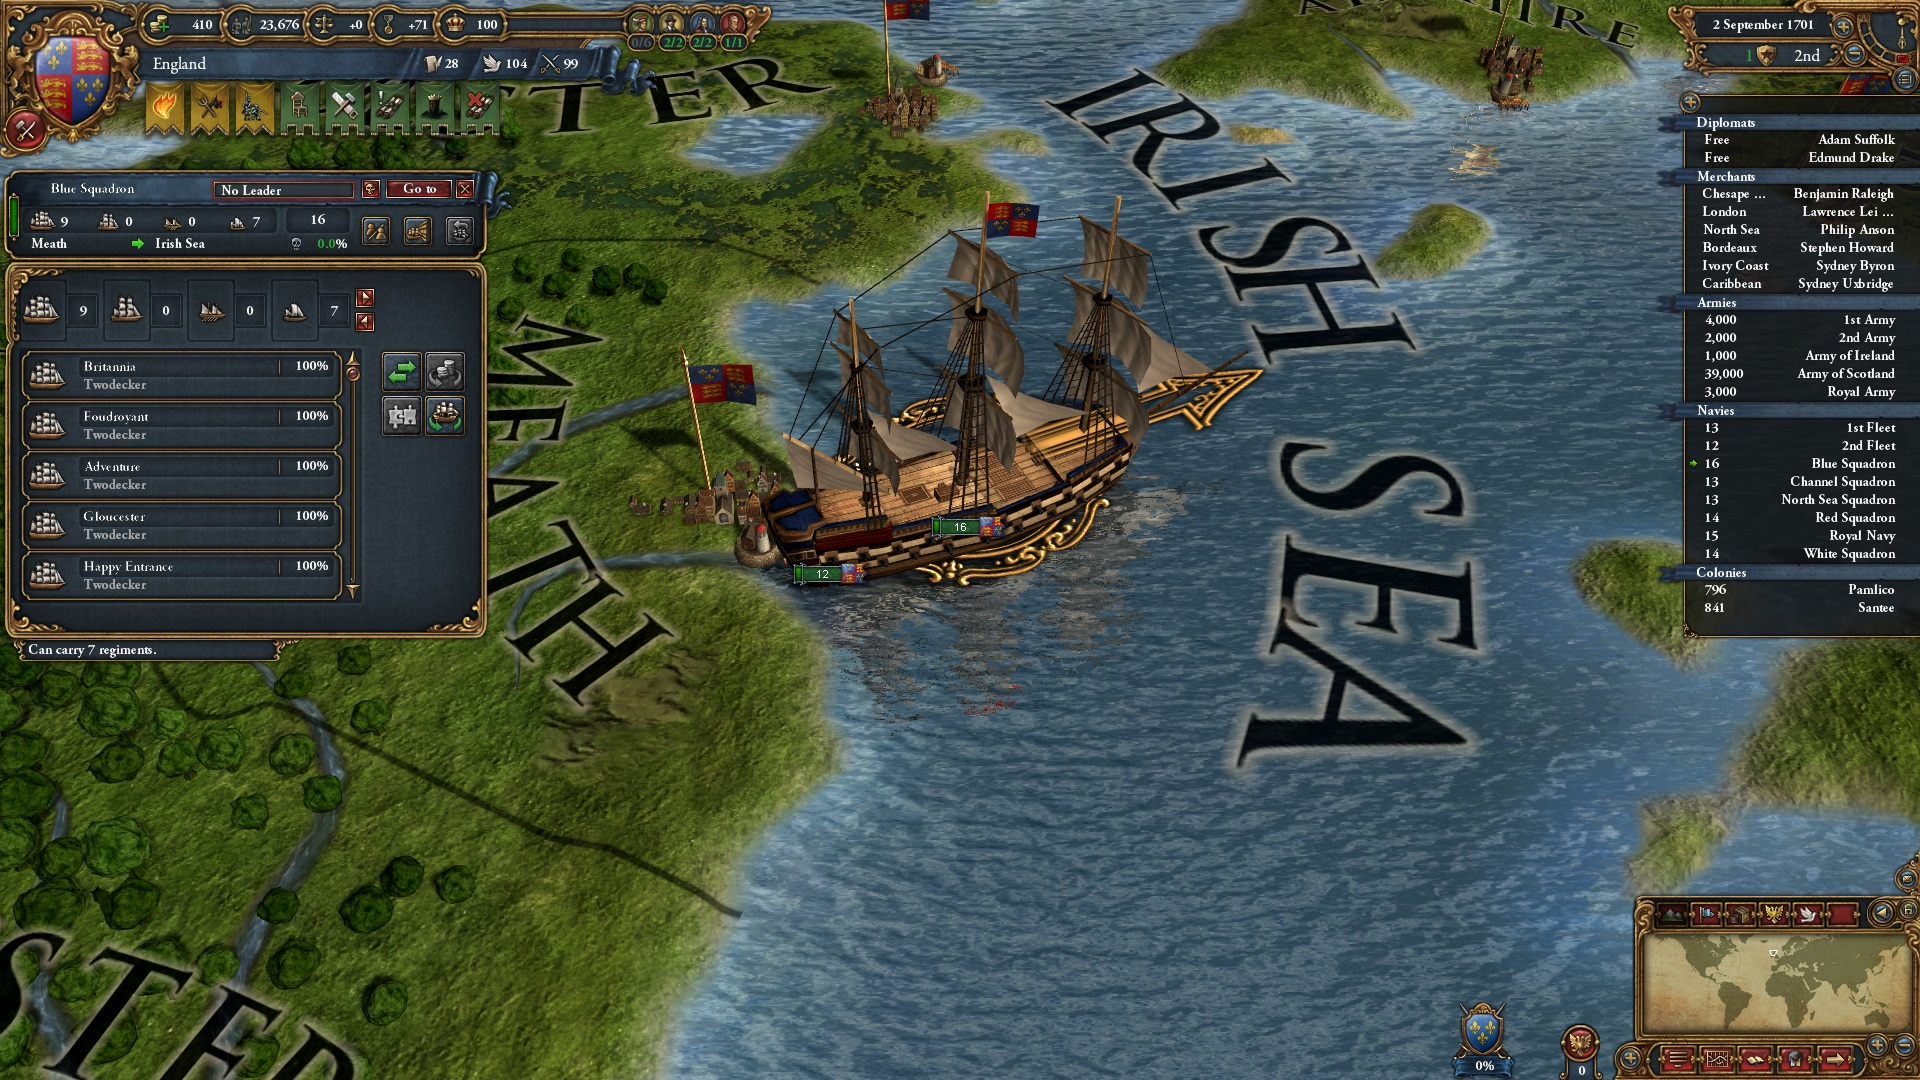 Europa universalis 4 дипломатическая репутация - 00